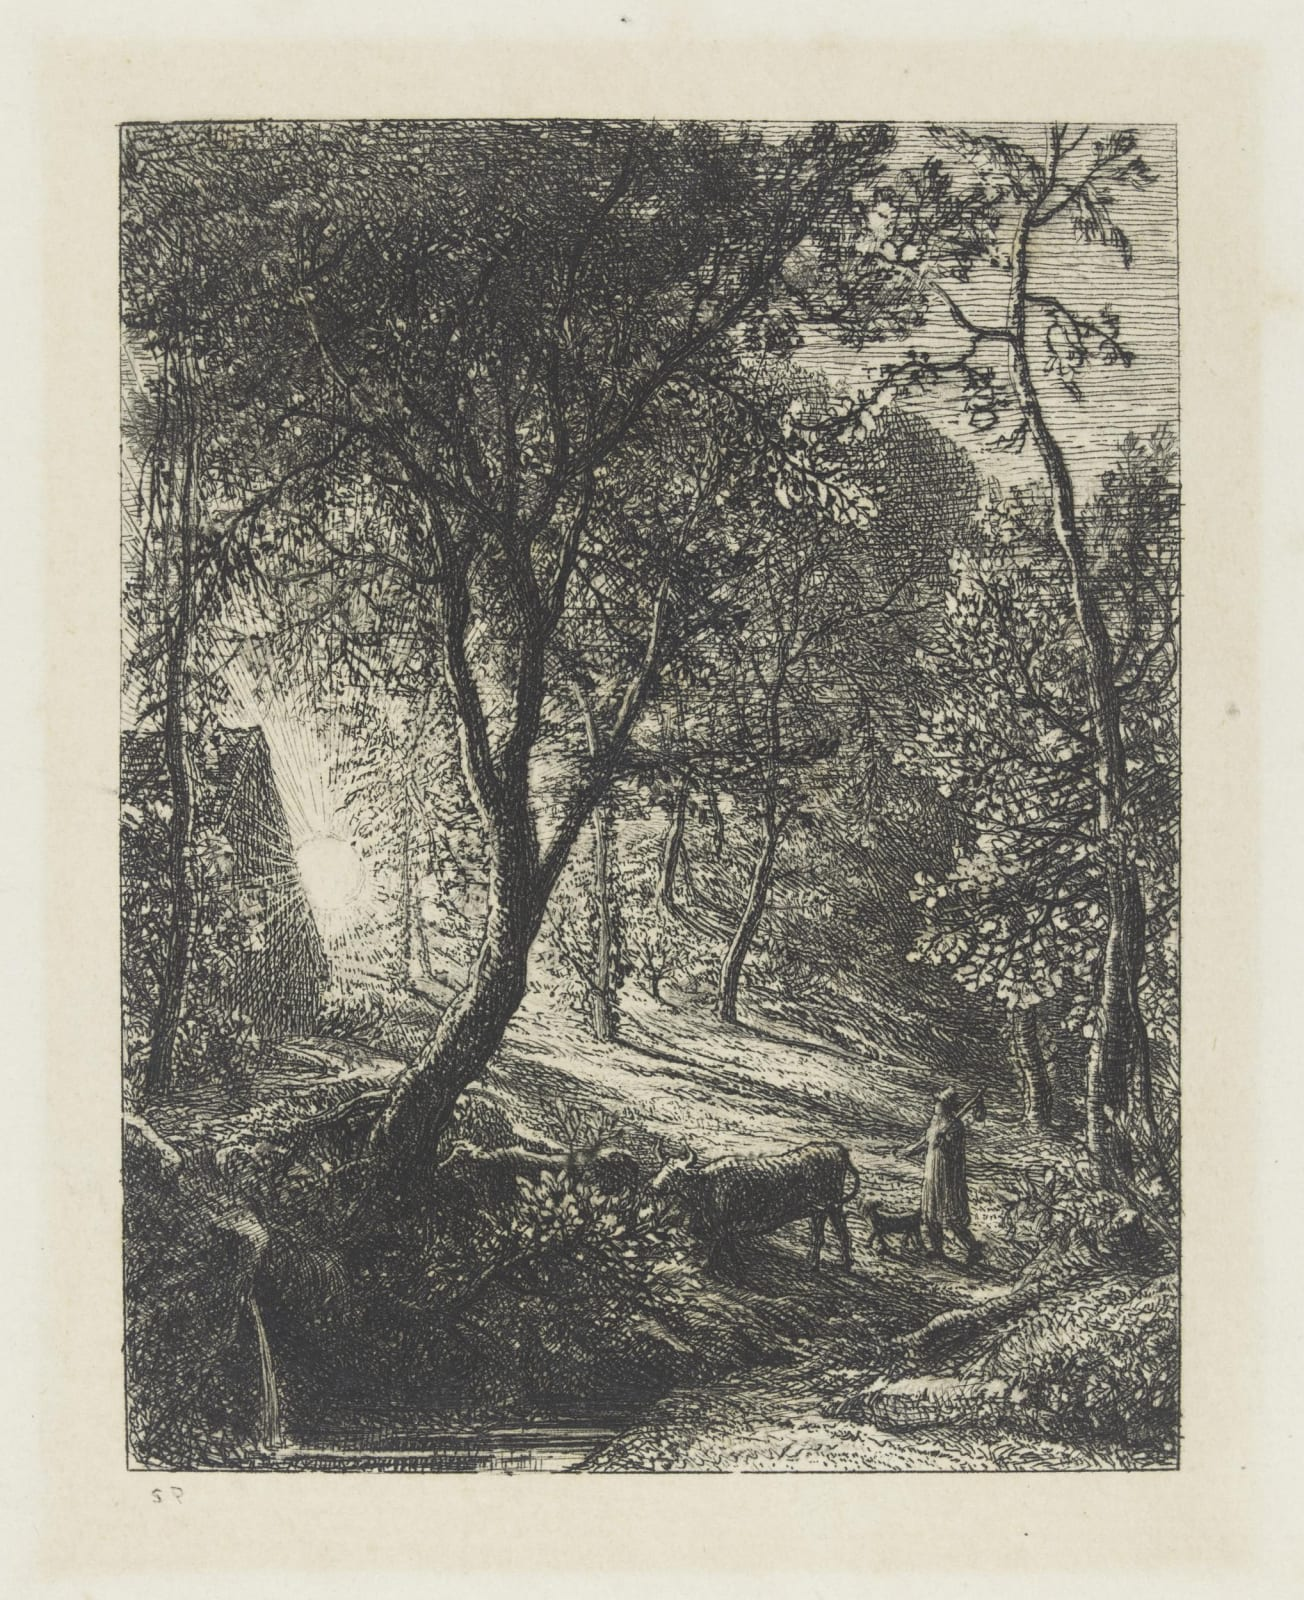 Samuel Palmer, The Herdsman's Cottage, 1850 Etching